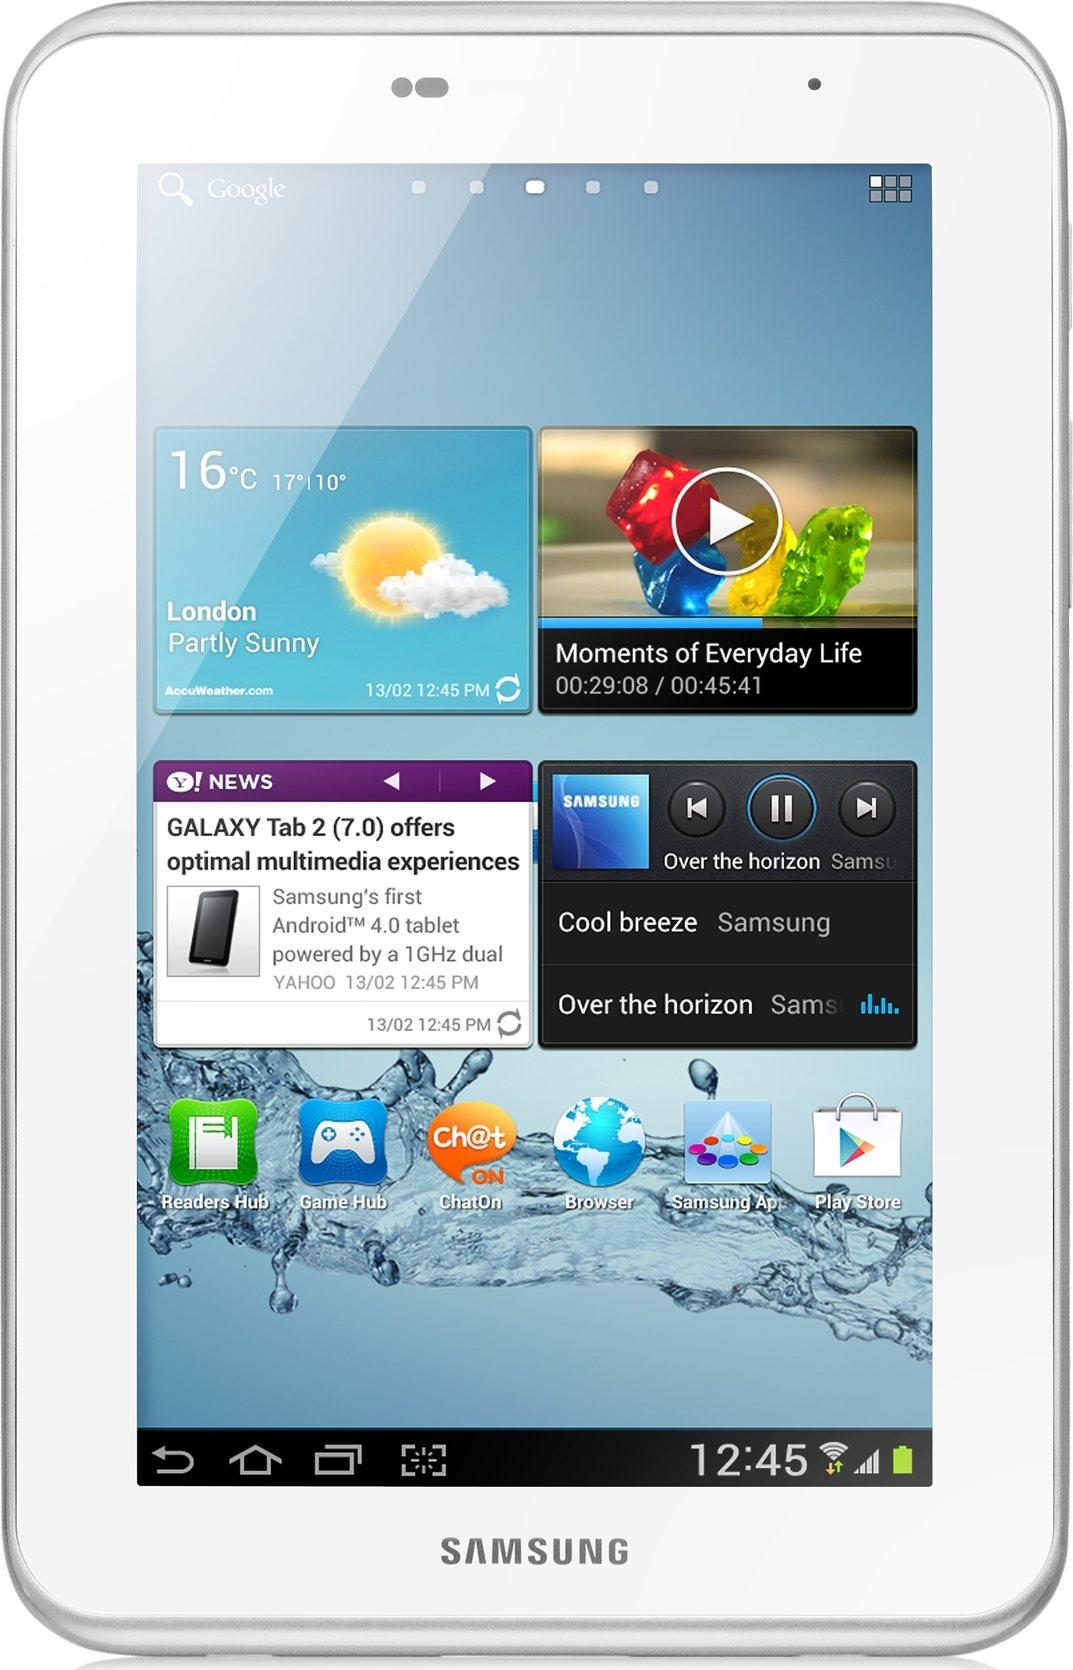 Galaxy Tab 2 7.0 WiFi GT-P3110